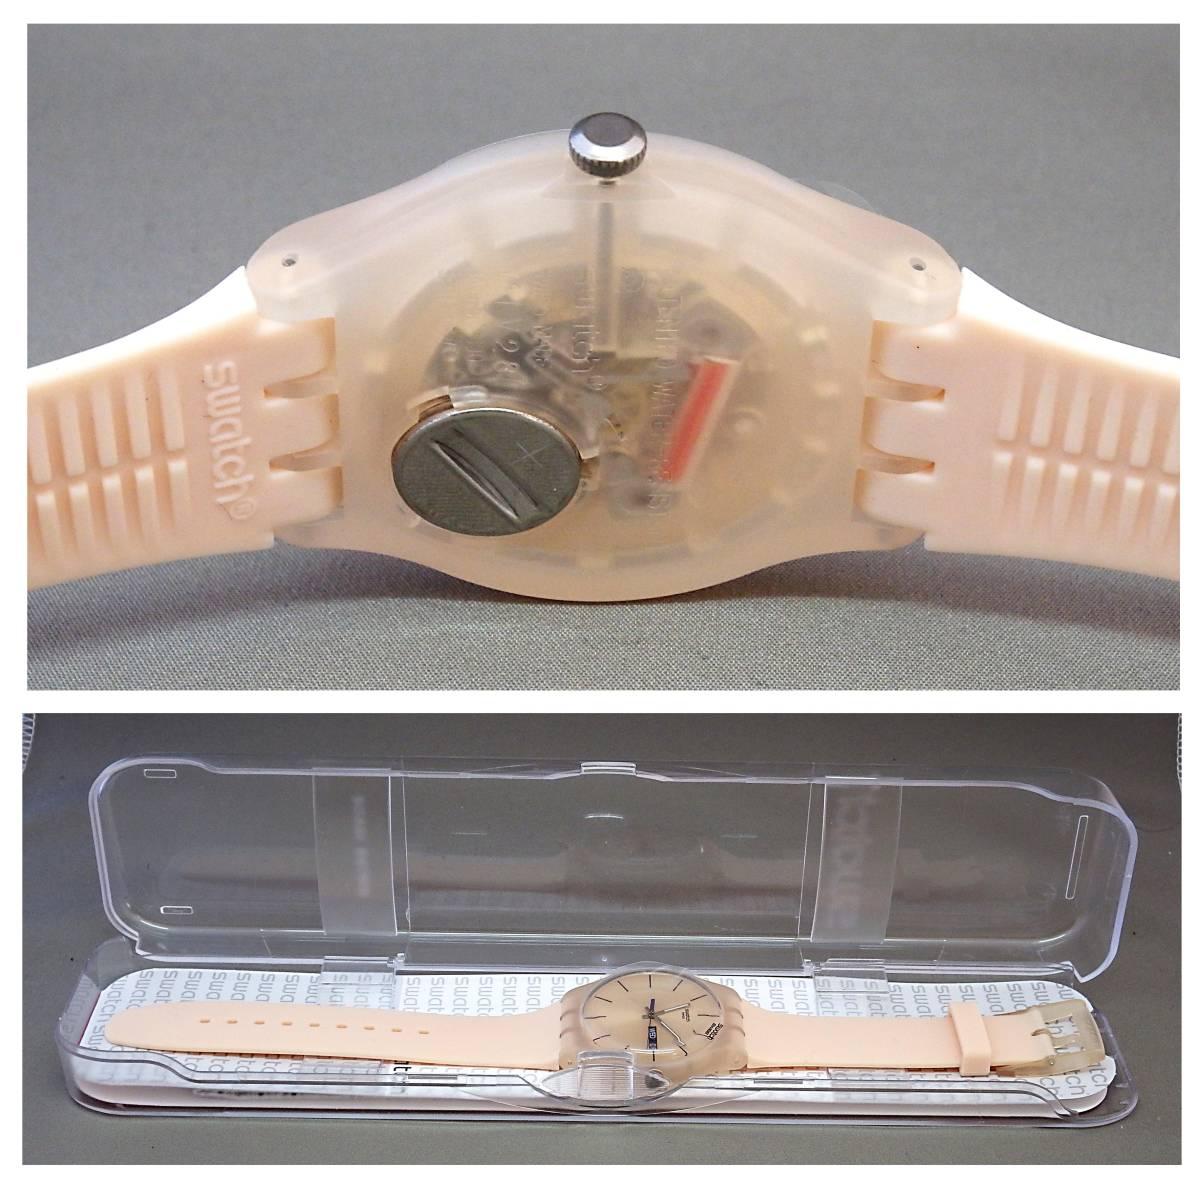 EU-9112■swatch スウォッチ SUOT700 メンズ腕時計 3針カレンダ- ケース付き 中古■切手可_画像4